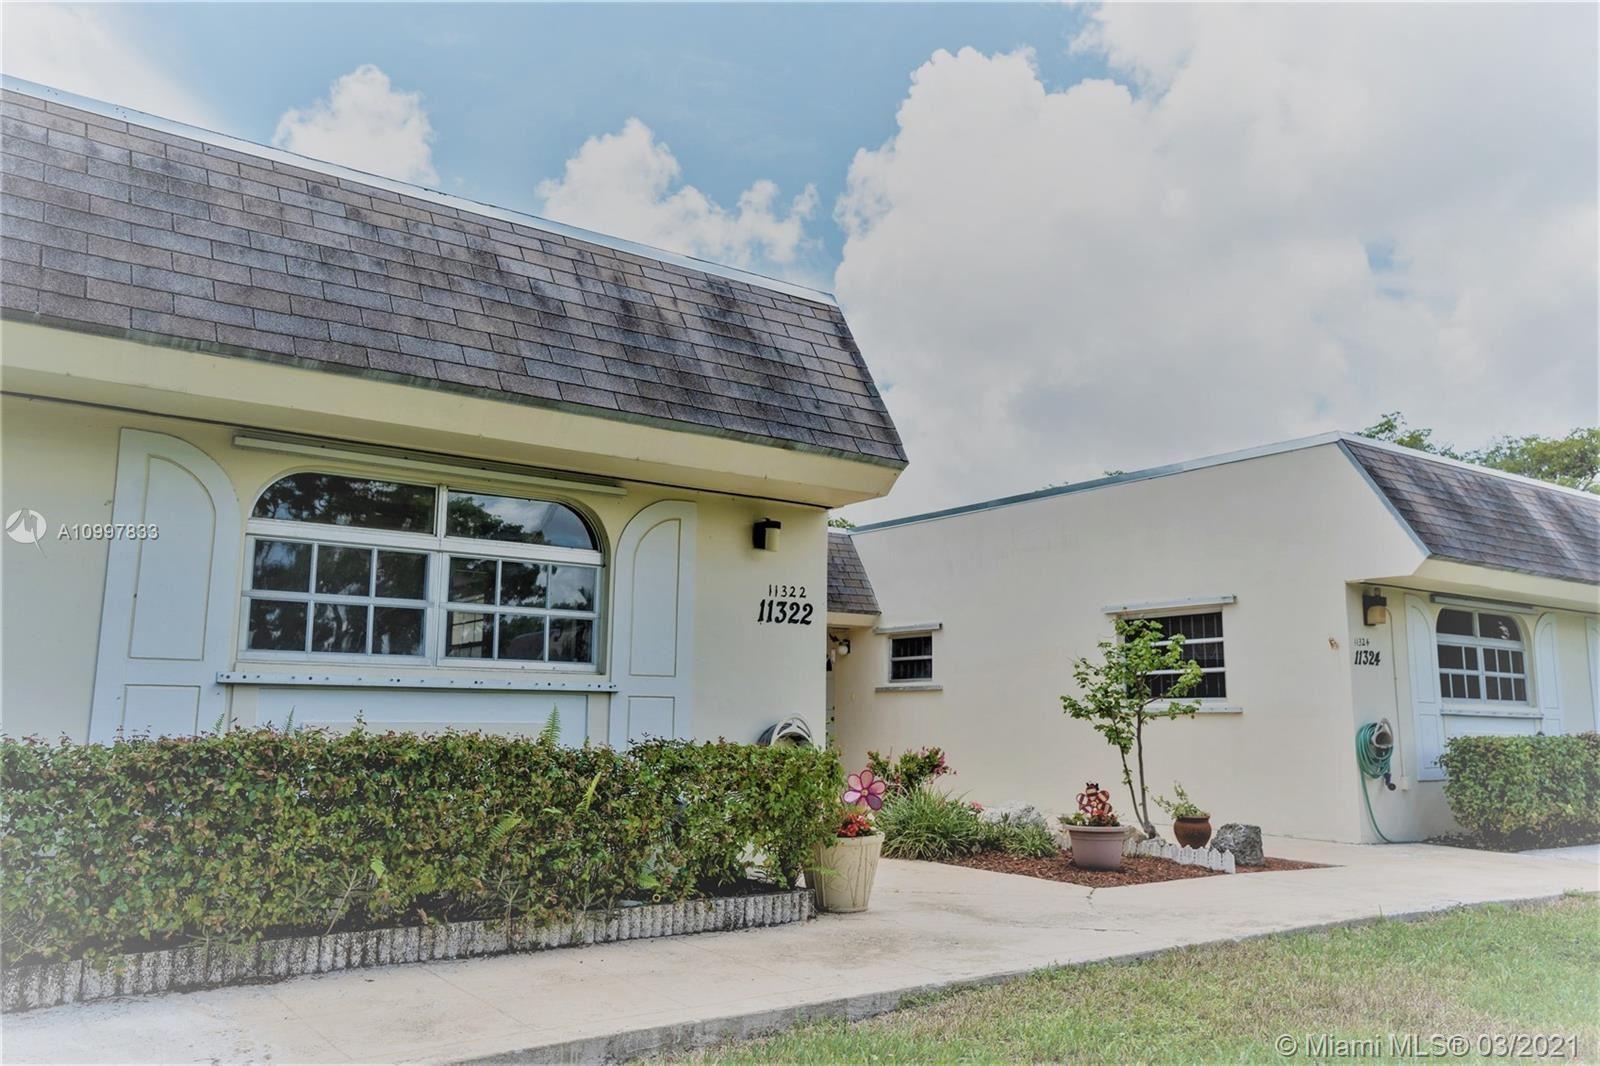 11322 SW 169th St #V3942, Miami, FL 33157 - #: A10997833